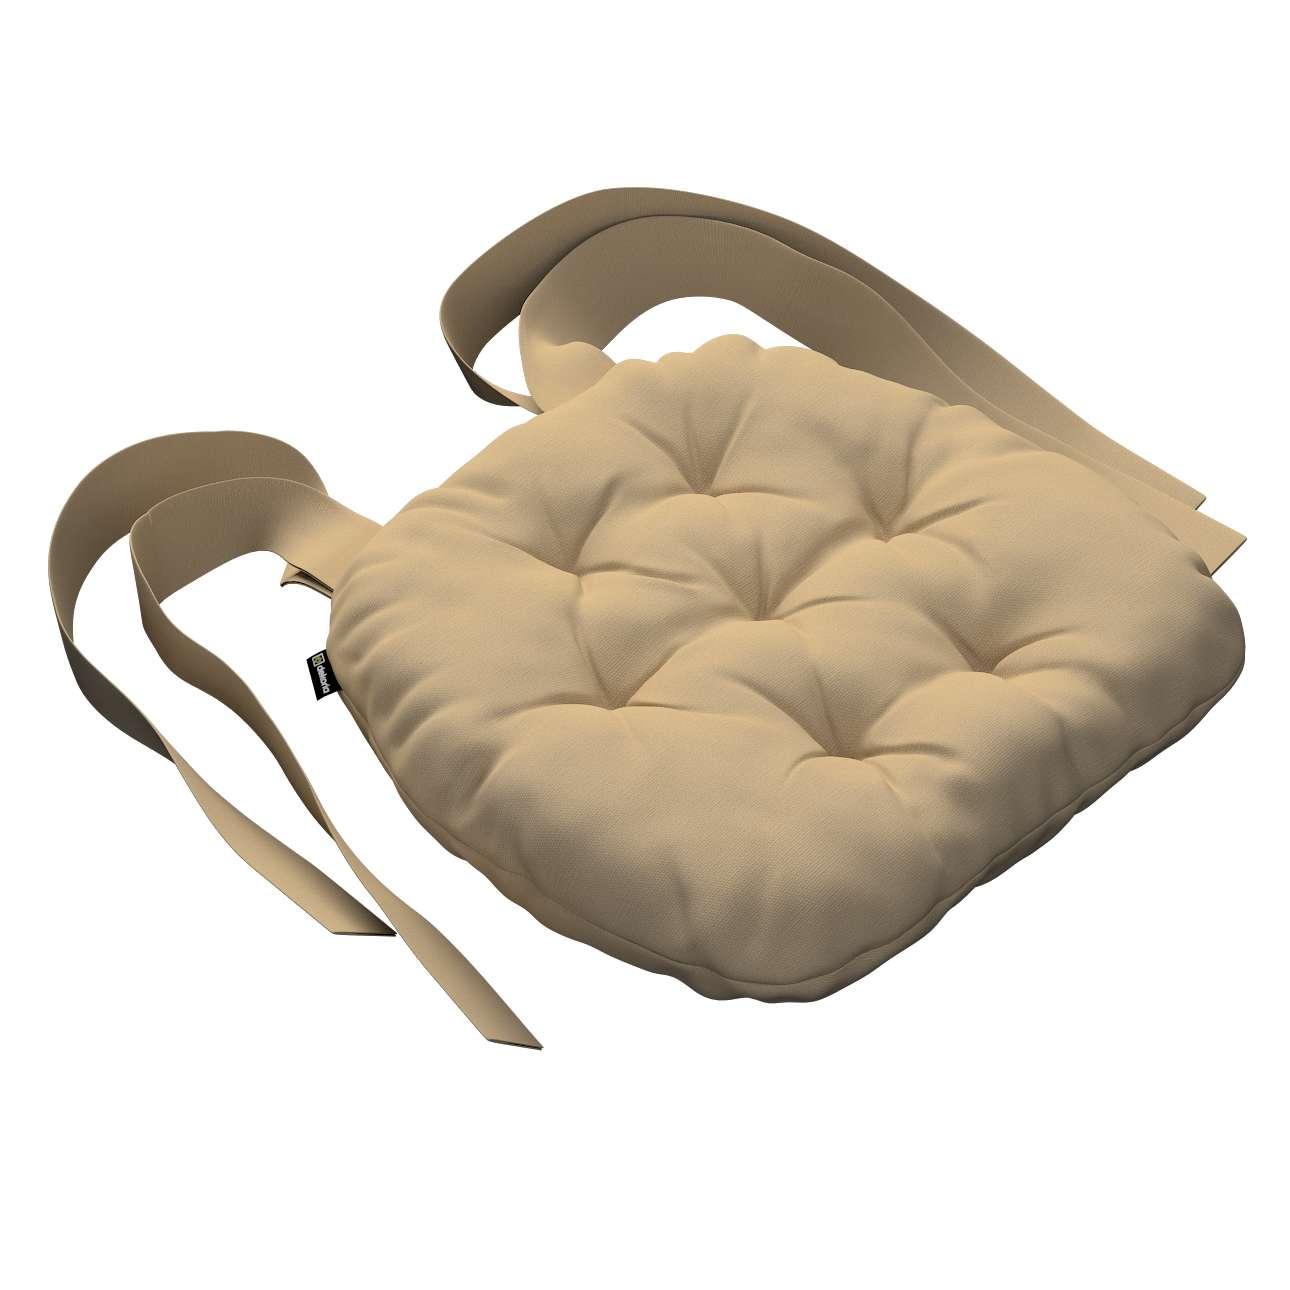 Sedák Martin se stuhami 40x37x8cm 40 x 37 x 8 cm v kolekci Cotton Panama, látka: 702-01